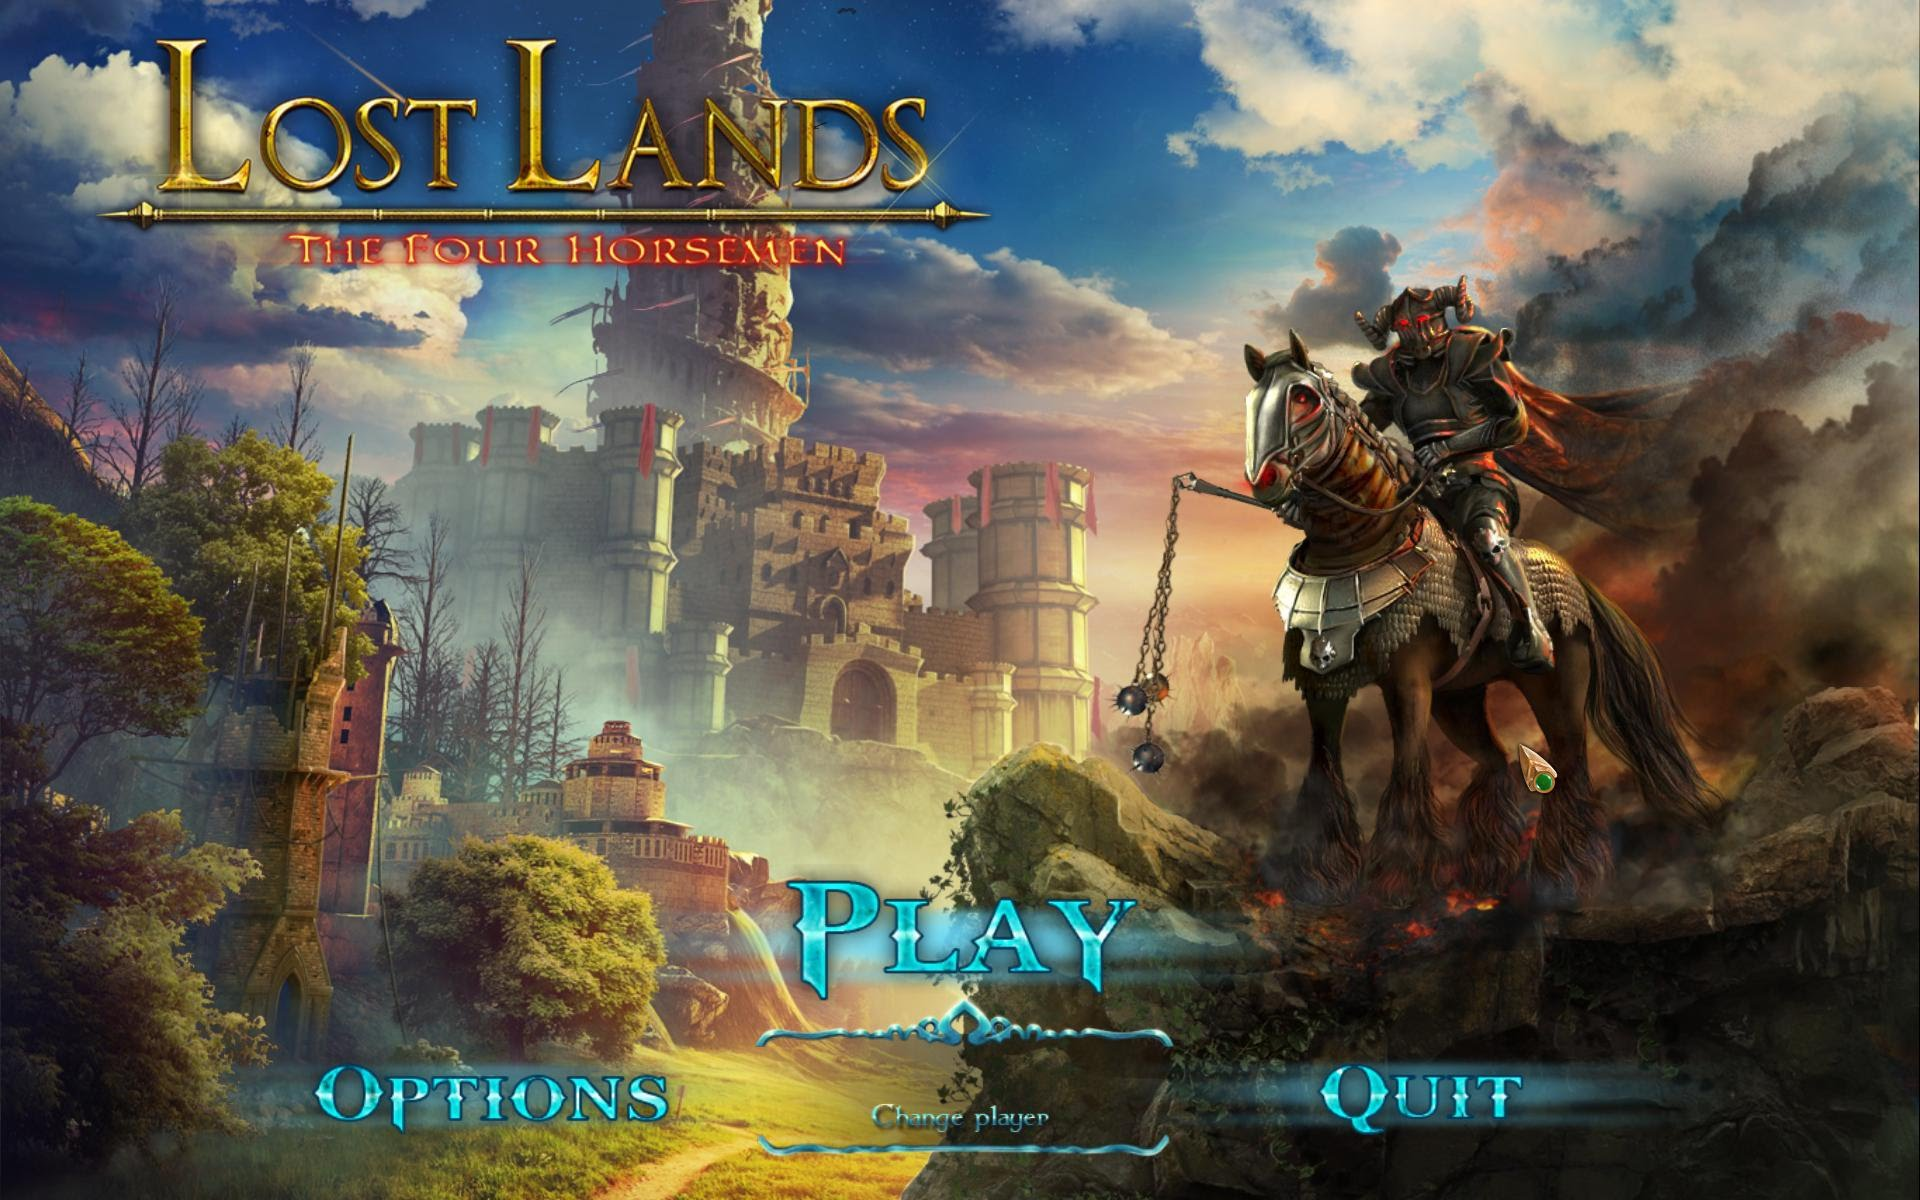 High Resolution Wallpaper | Lost Lands 1920x1200 px